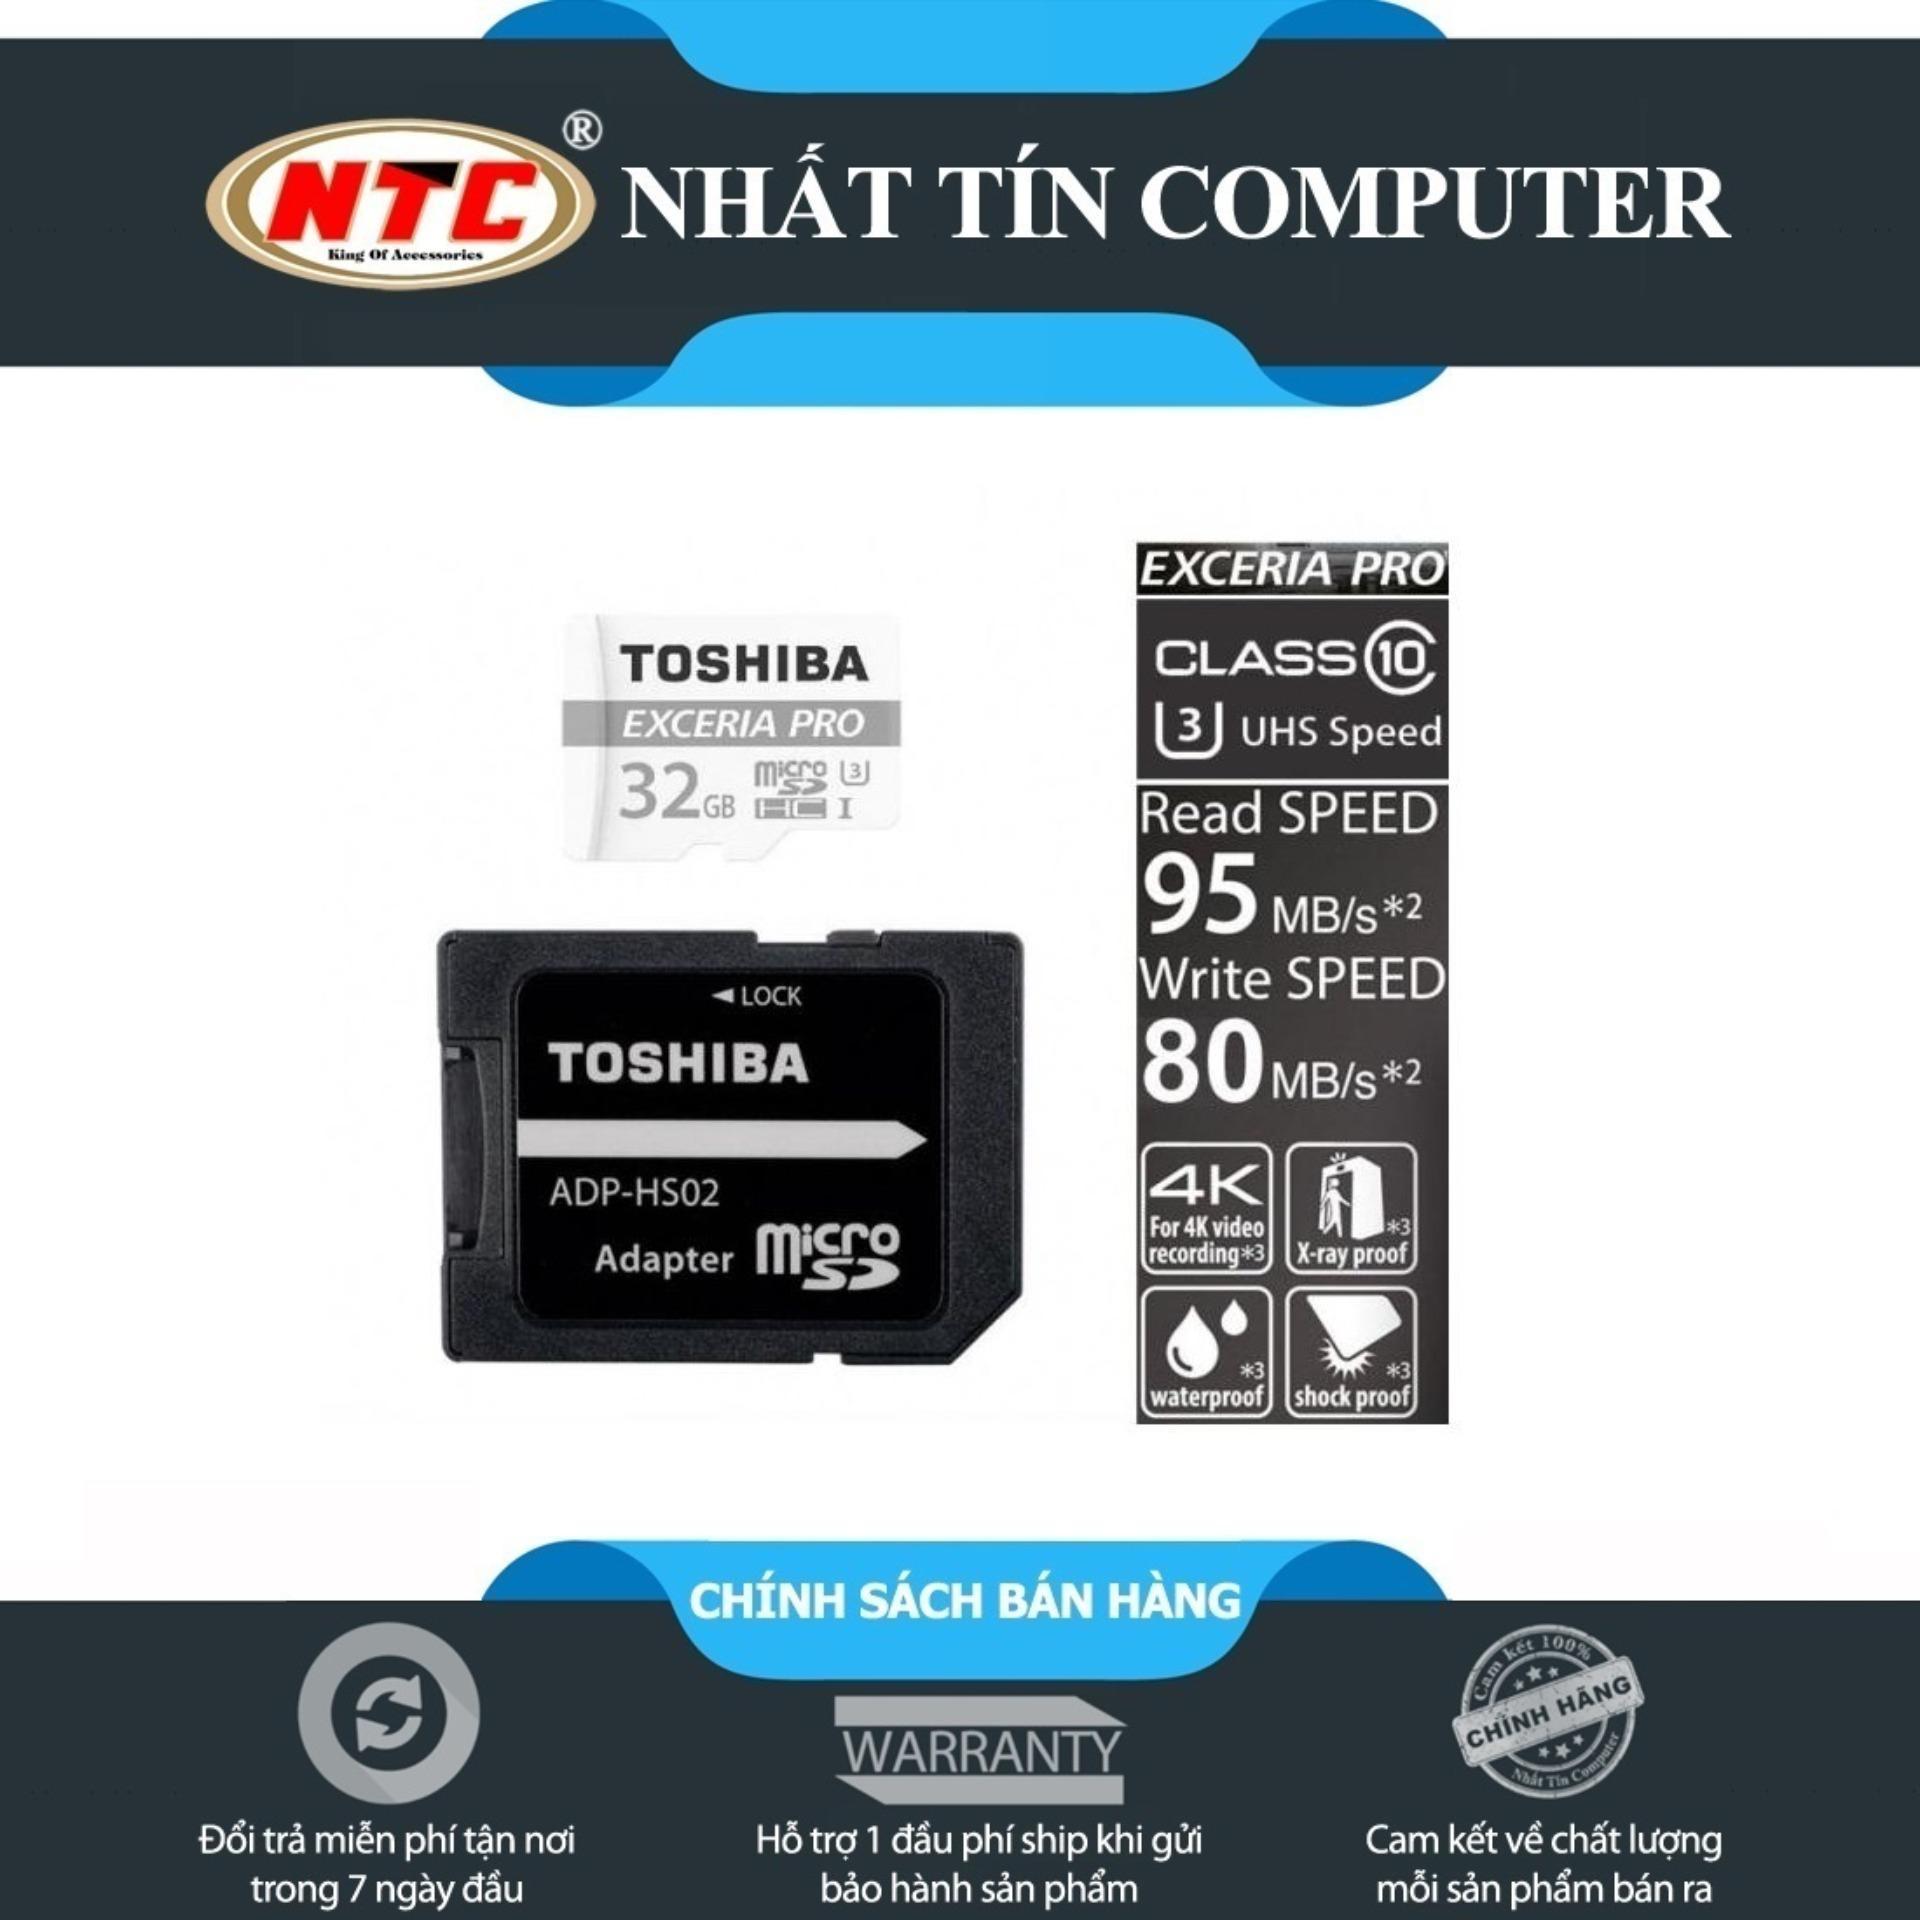 Thẻ nhớ MicroSDXC Toshiba Exceria Pro M401 64GB UHS-I U3 4K 95MB/s (Trắng)